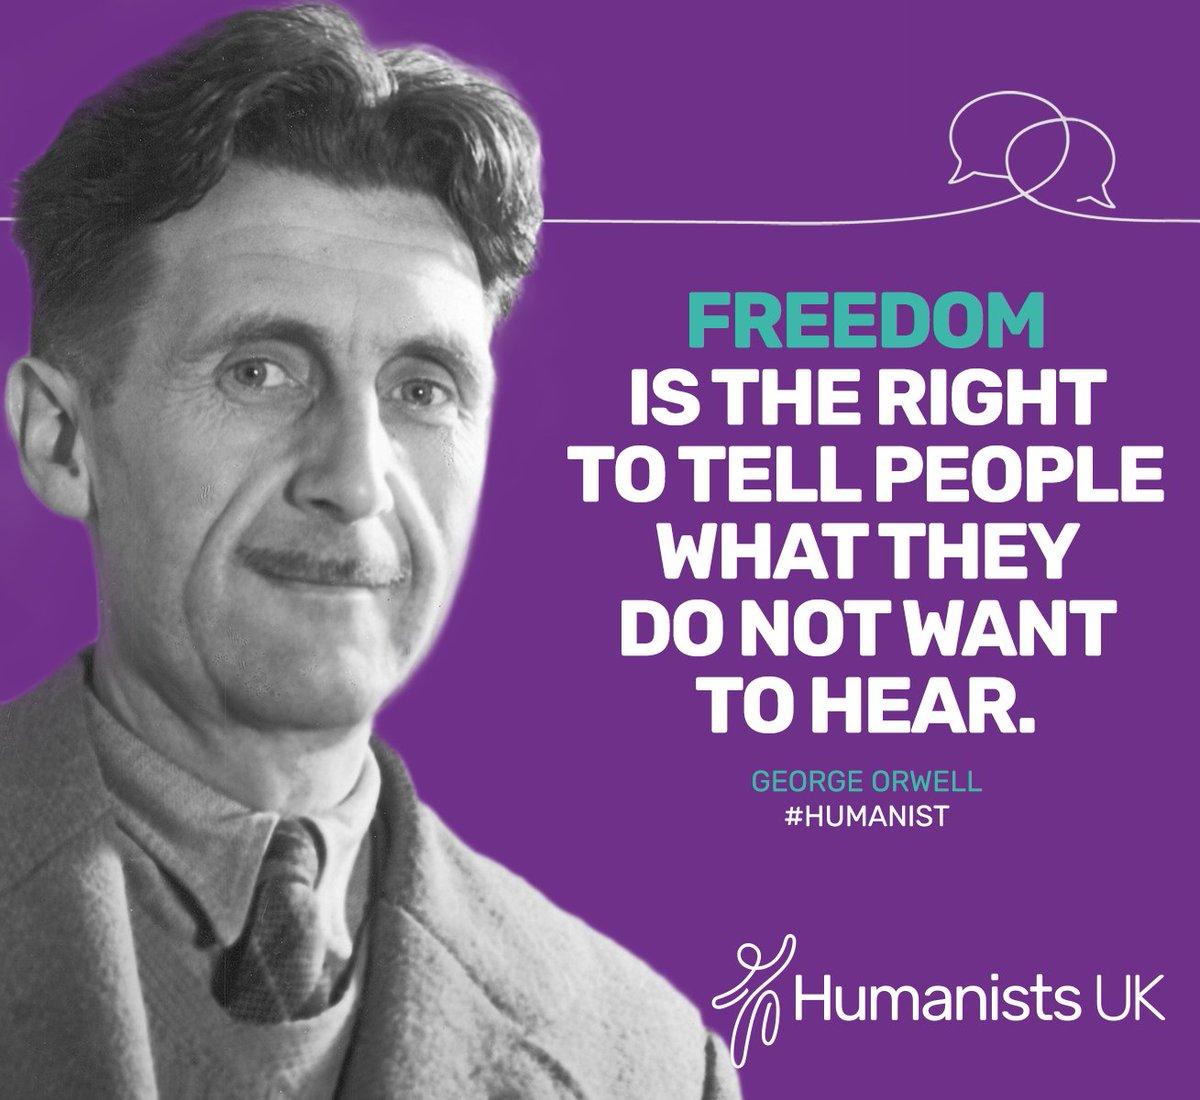 Humanists_UK OnThisDay